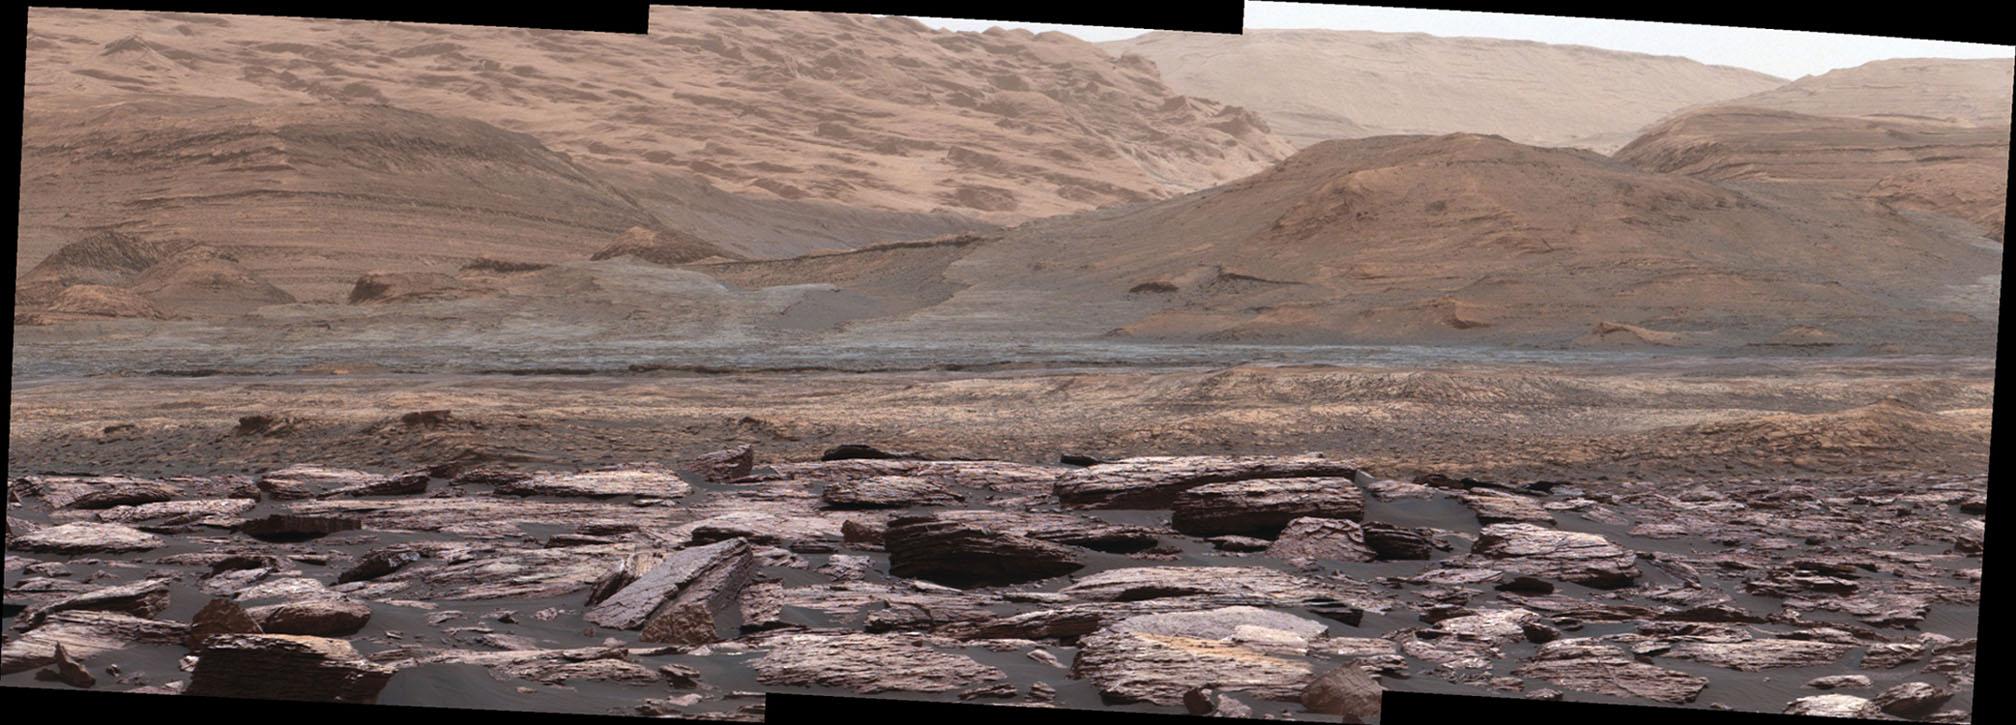 Curiosity picture showing color variations on Mount Sharp, Mars. - Image Credit: NASA/JPL